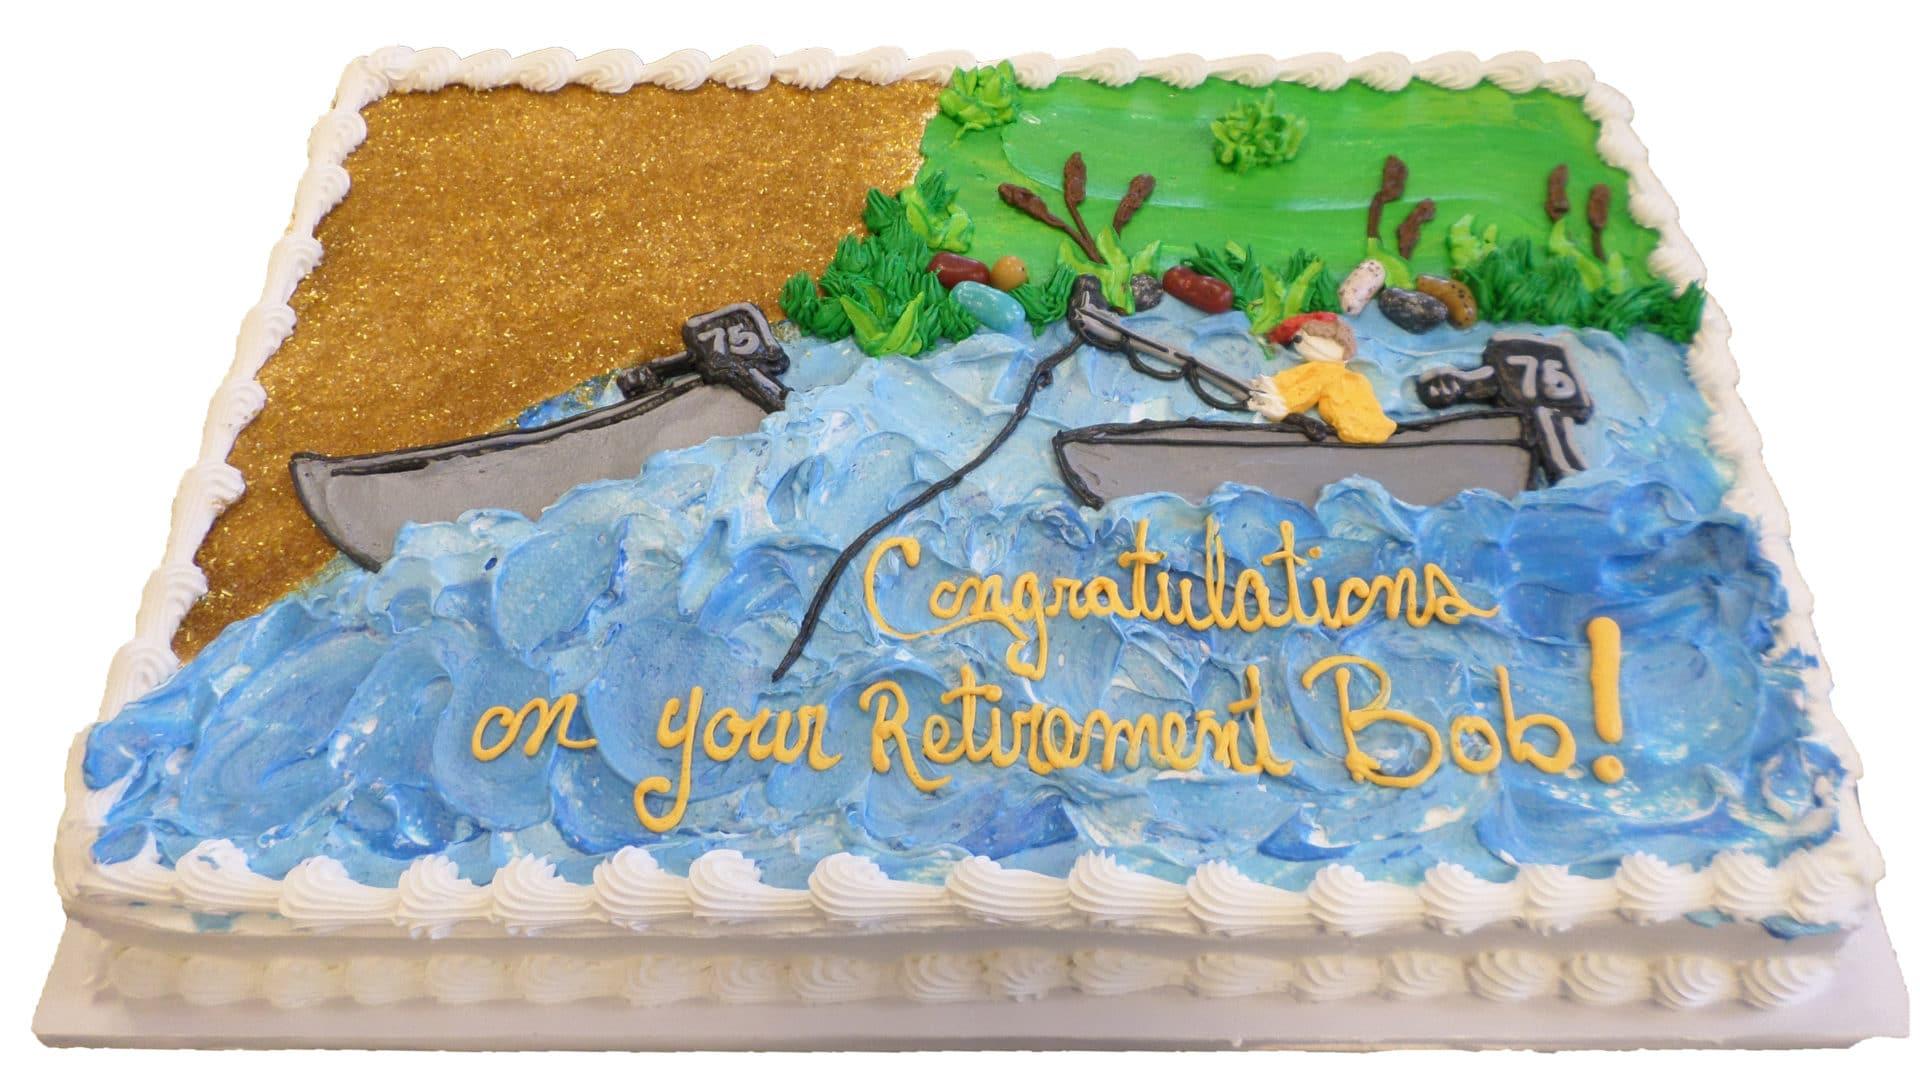 Retirement Cake 5